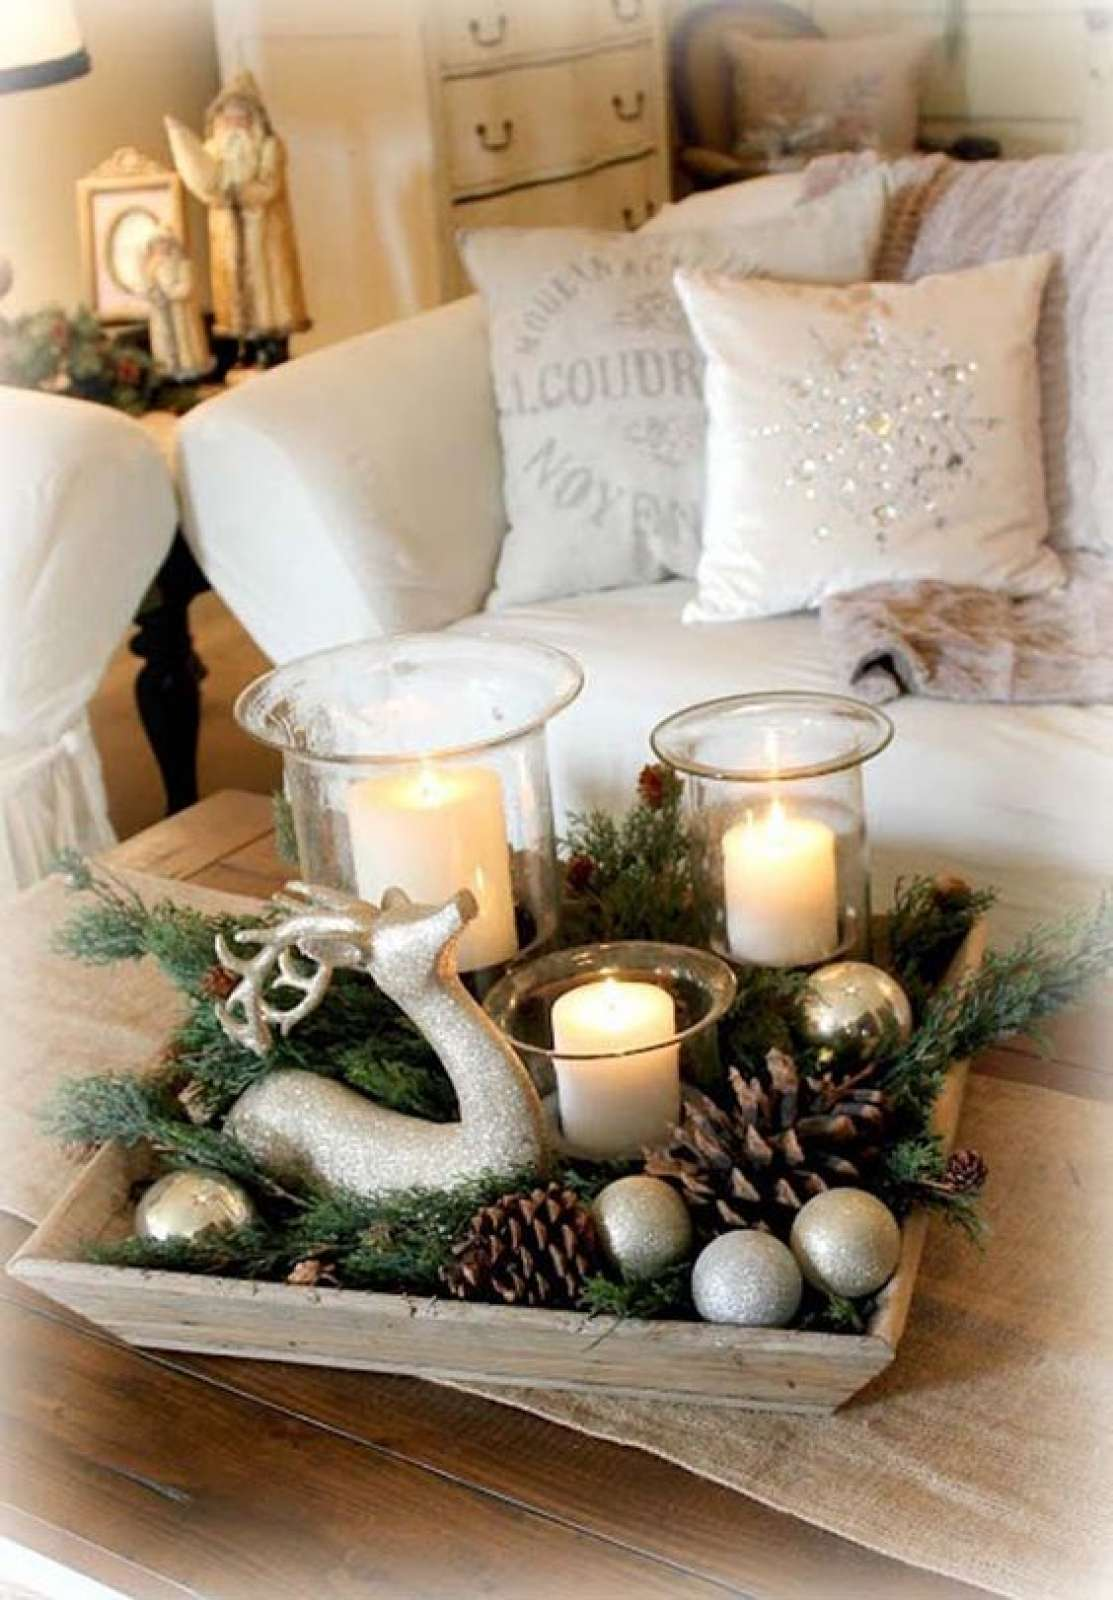 Reindeer Coffee Table Centerpiece